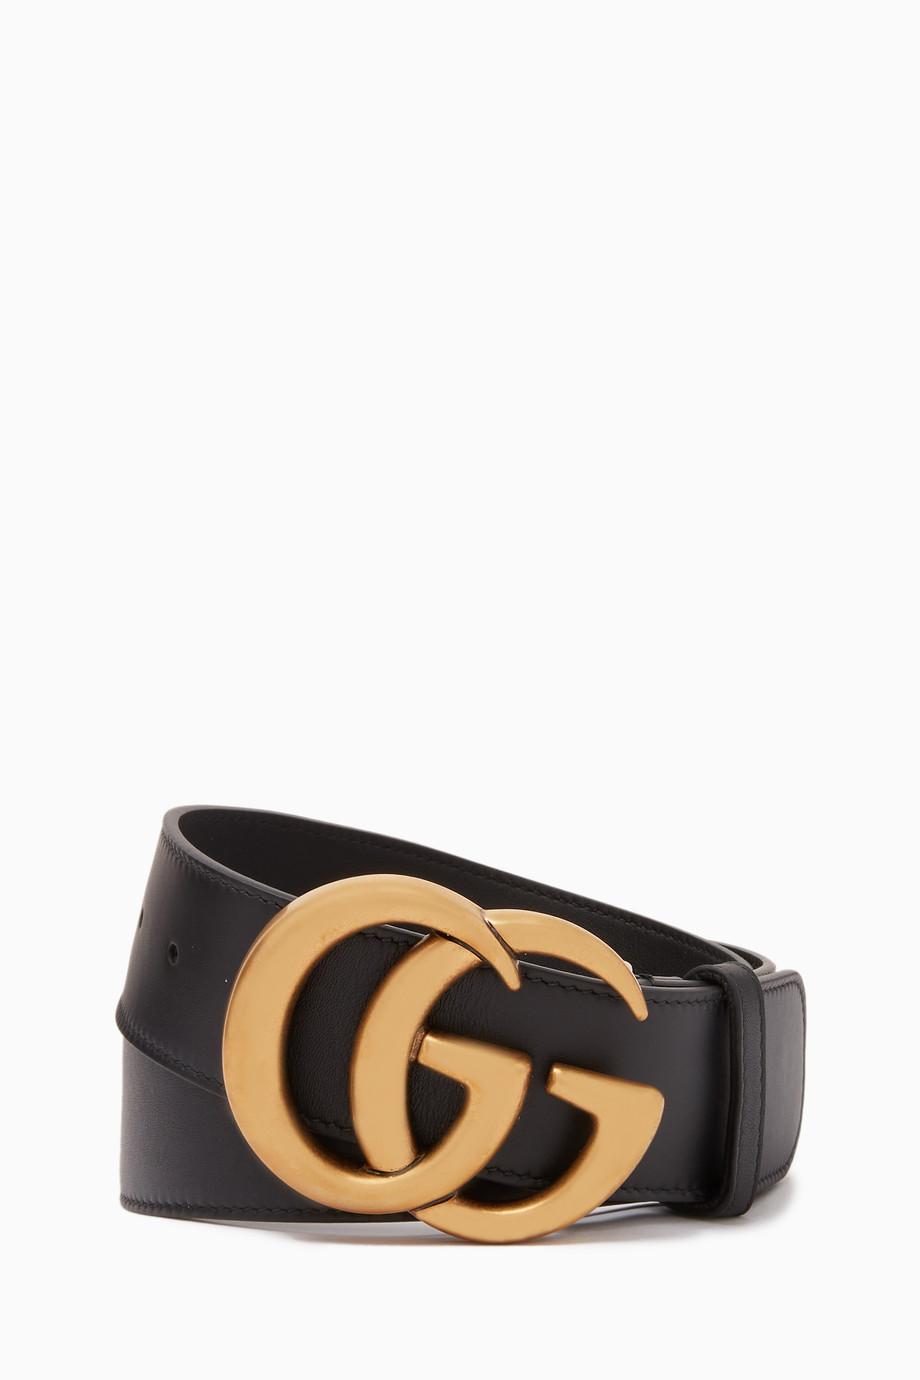 f7013e296 Shop Gucci Black Black Double G Buckle Leather Belt for Women ...